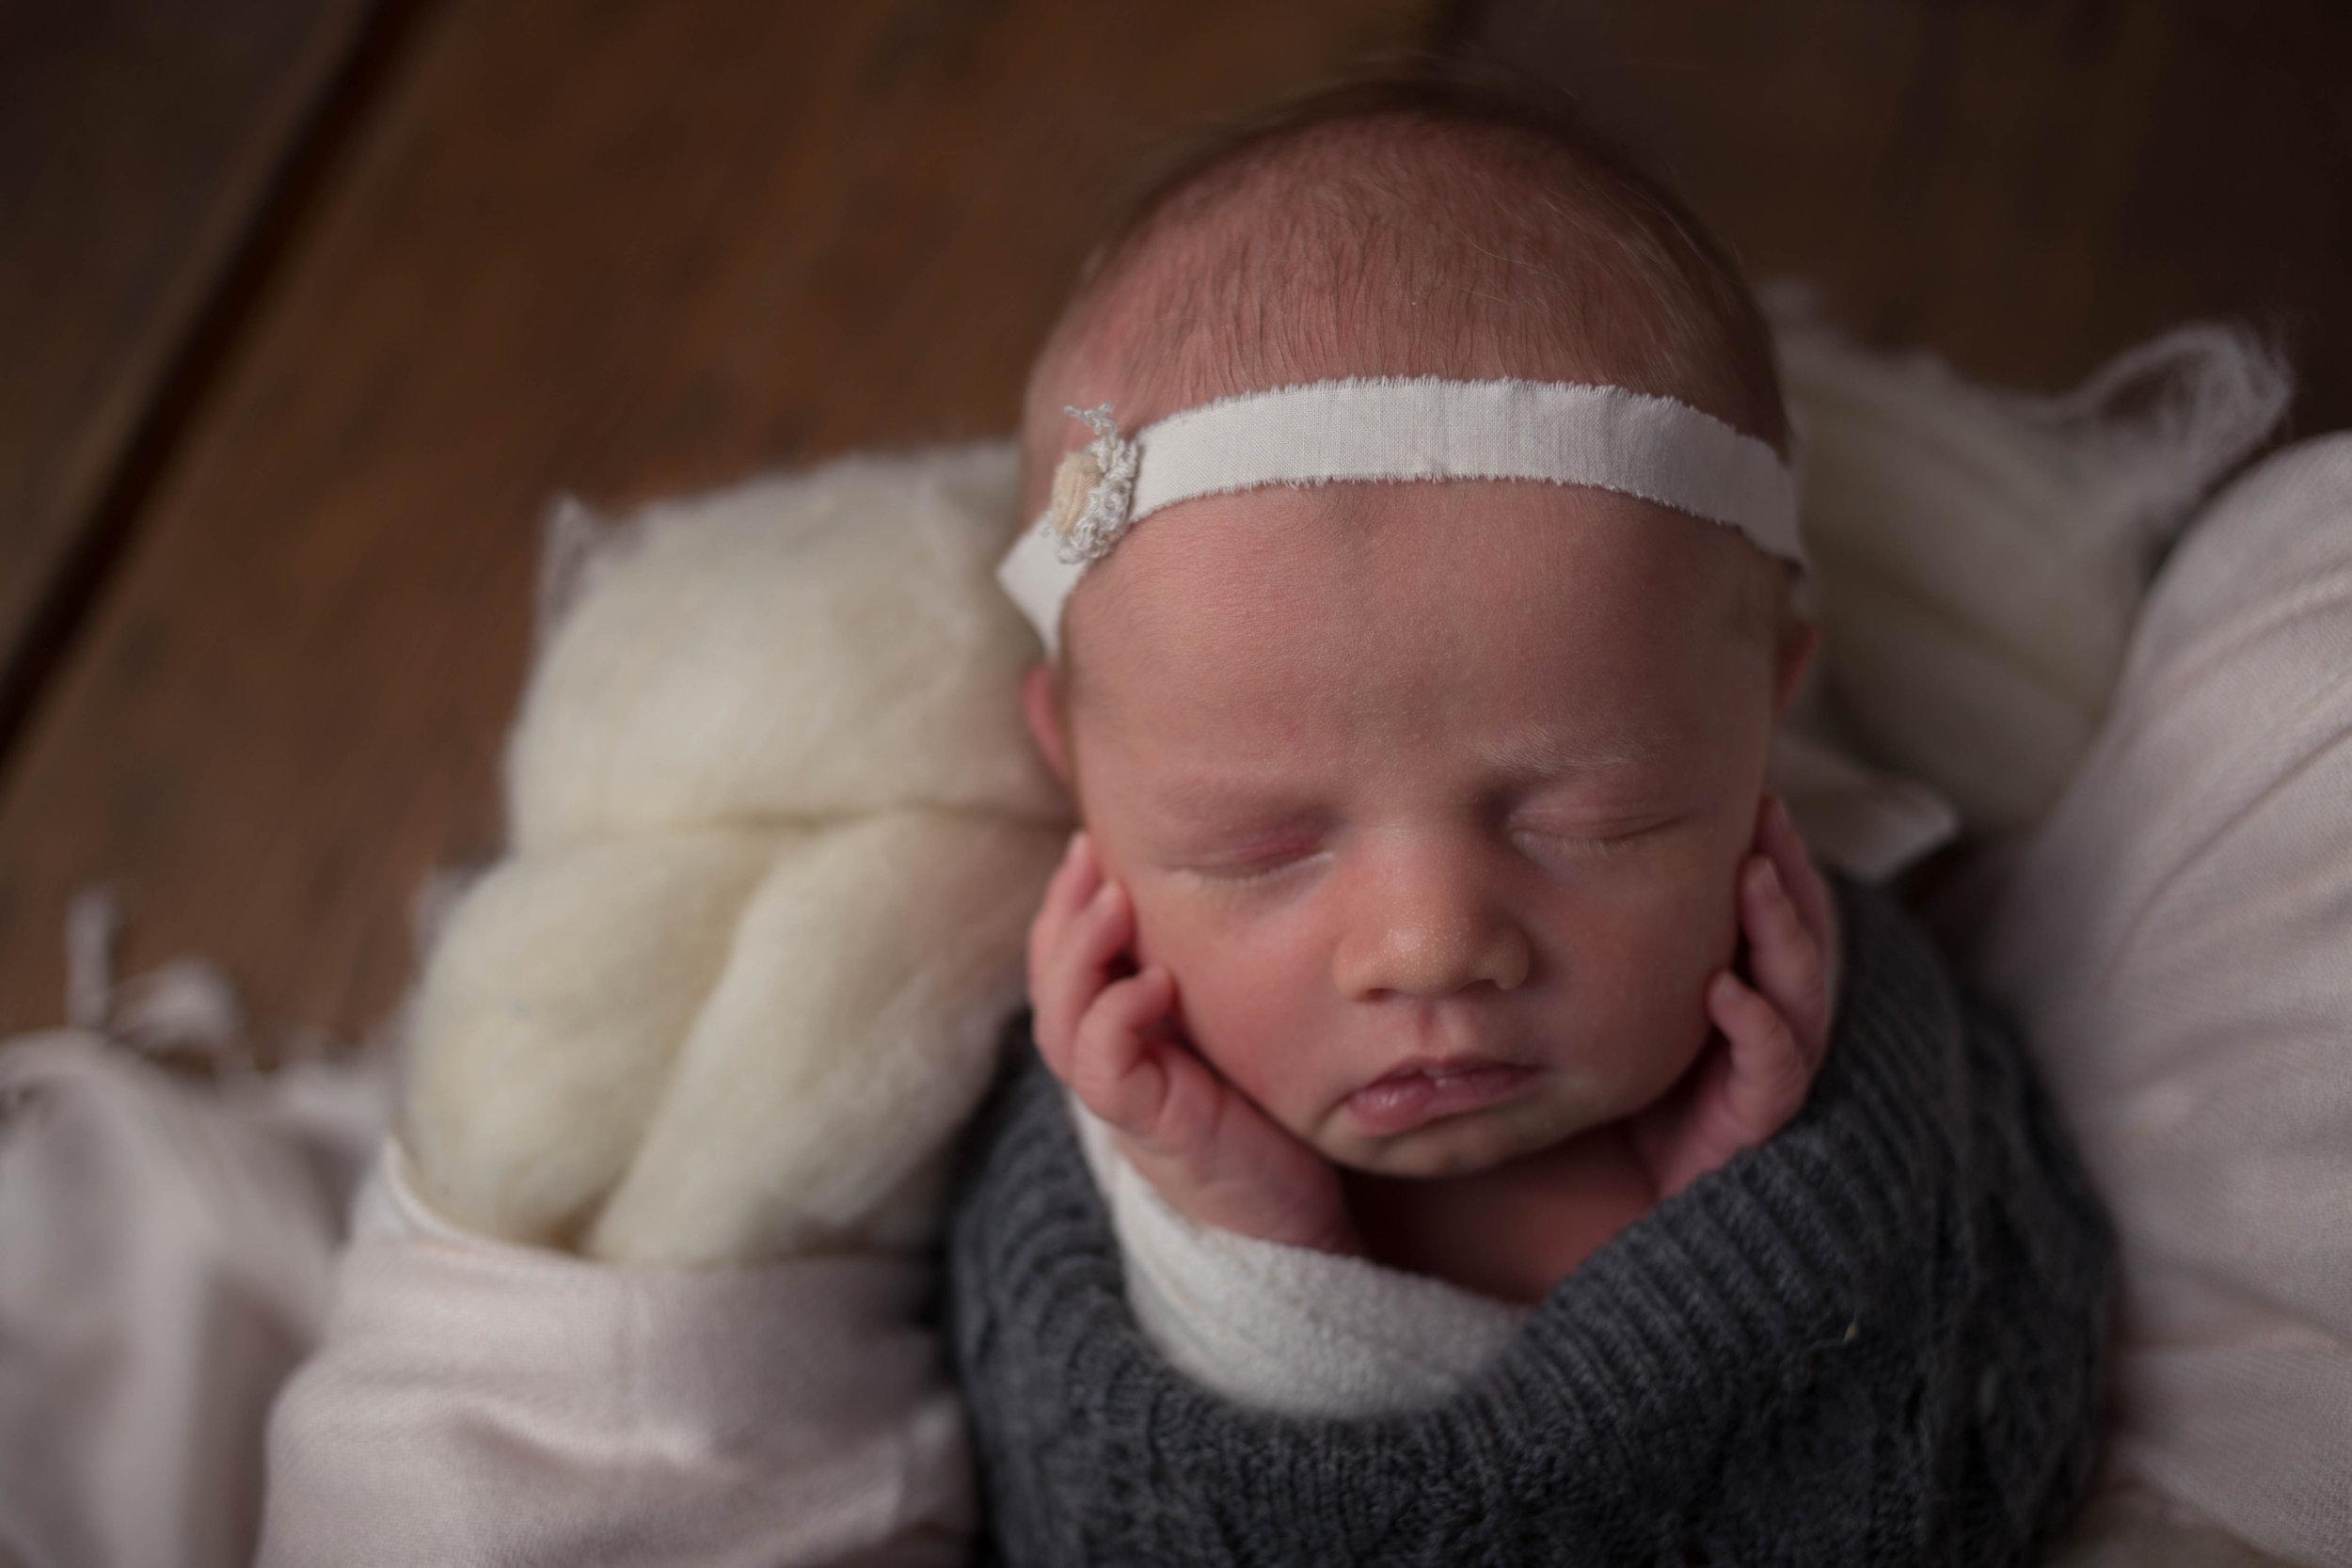 Studiofotografie  sioux falls newborn photographer  sioux falls newborn photographers  newborn photography